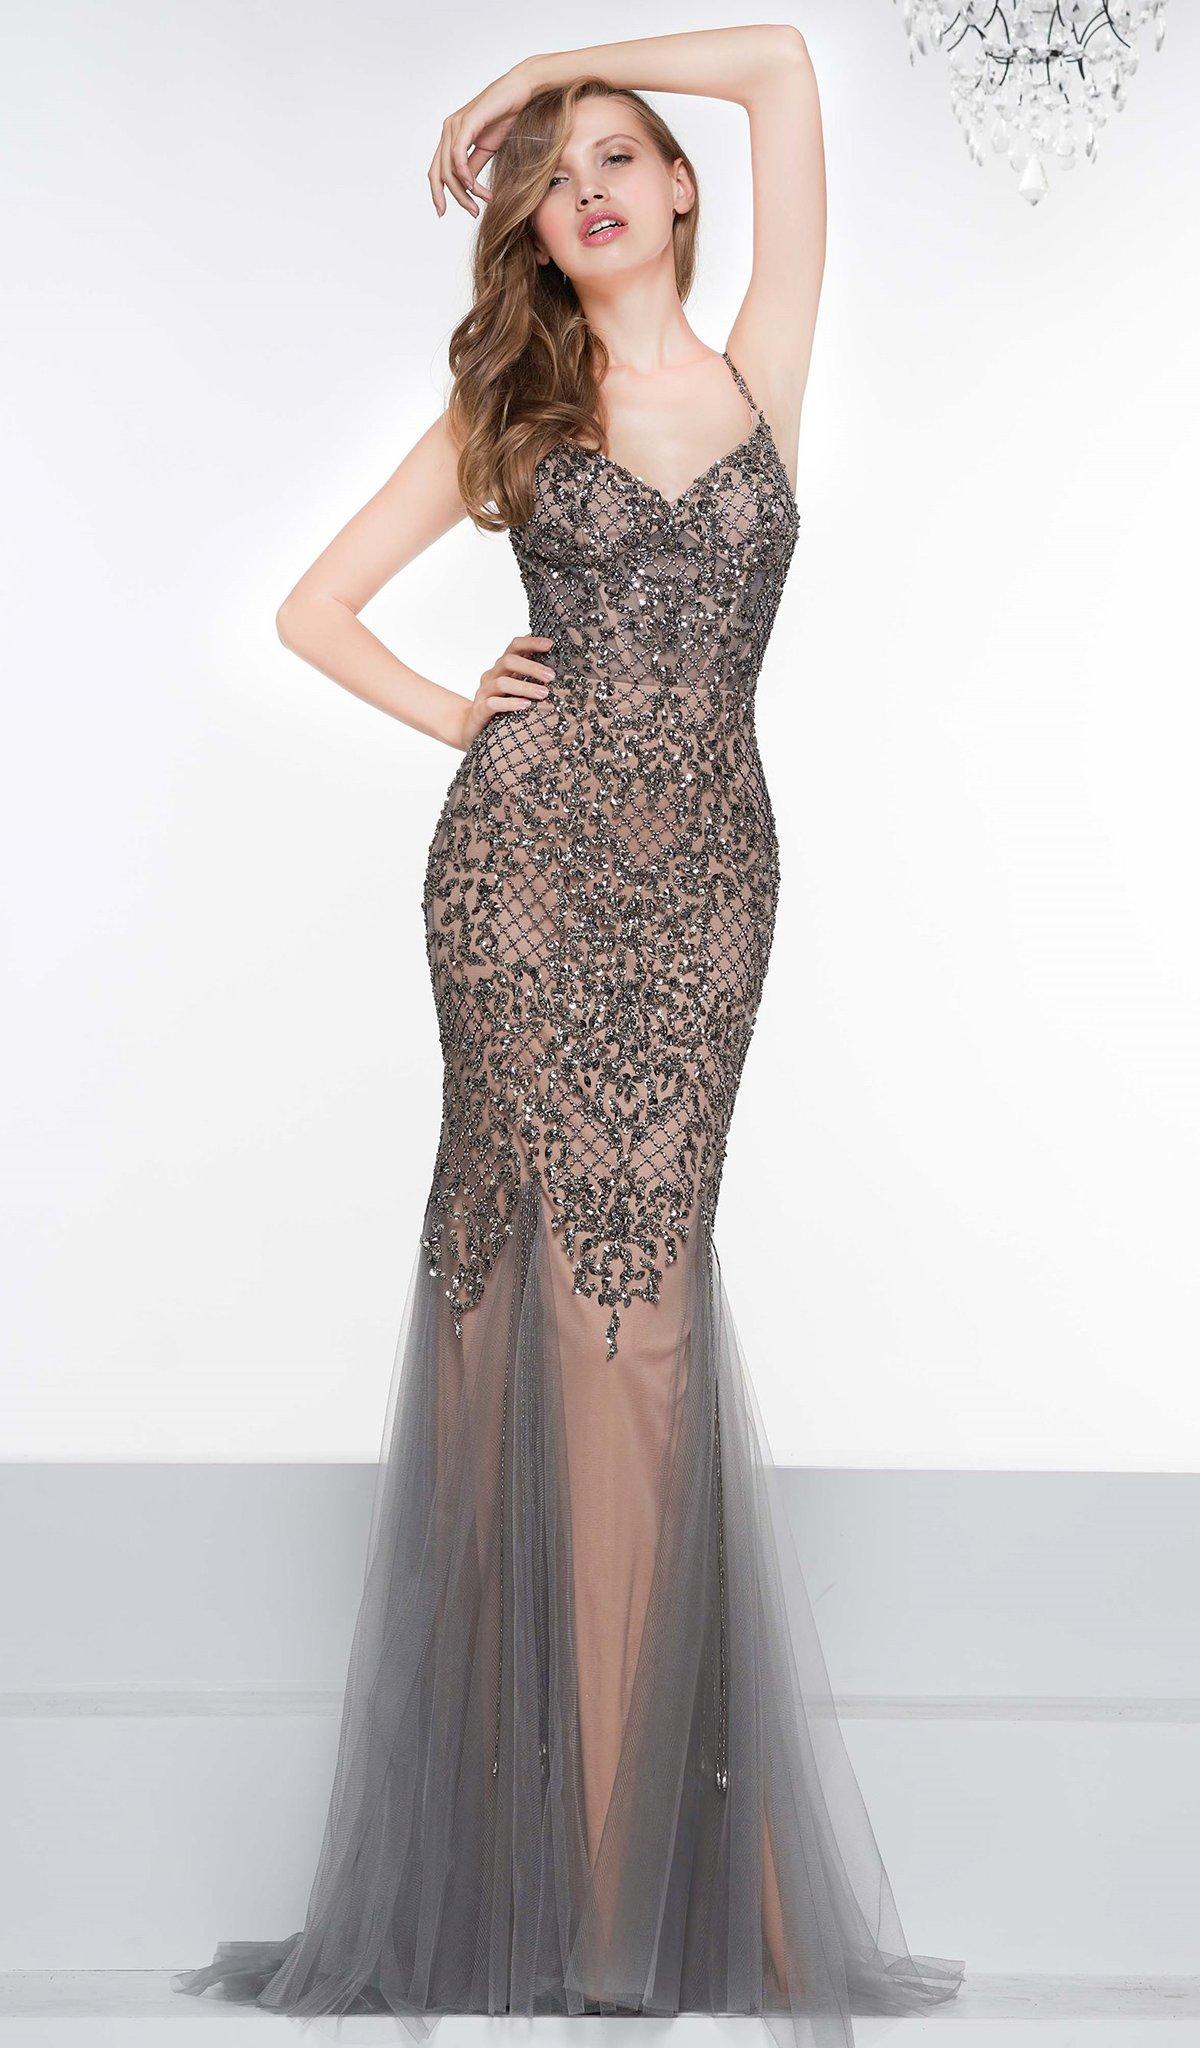 Colors Dress - 2091 Metallic Lattice Beaded Illusion Corset Gown